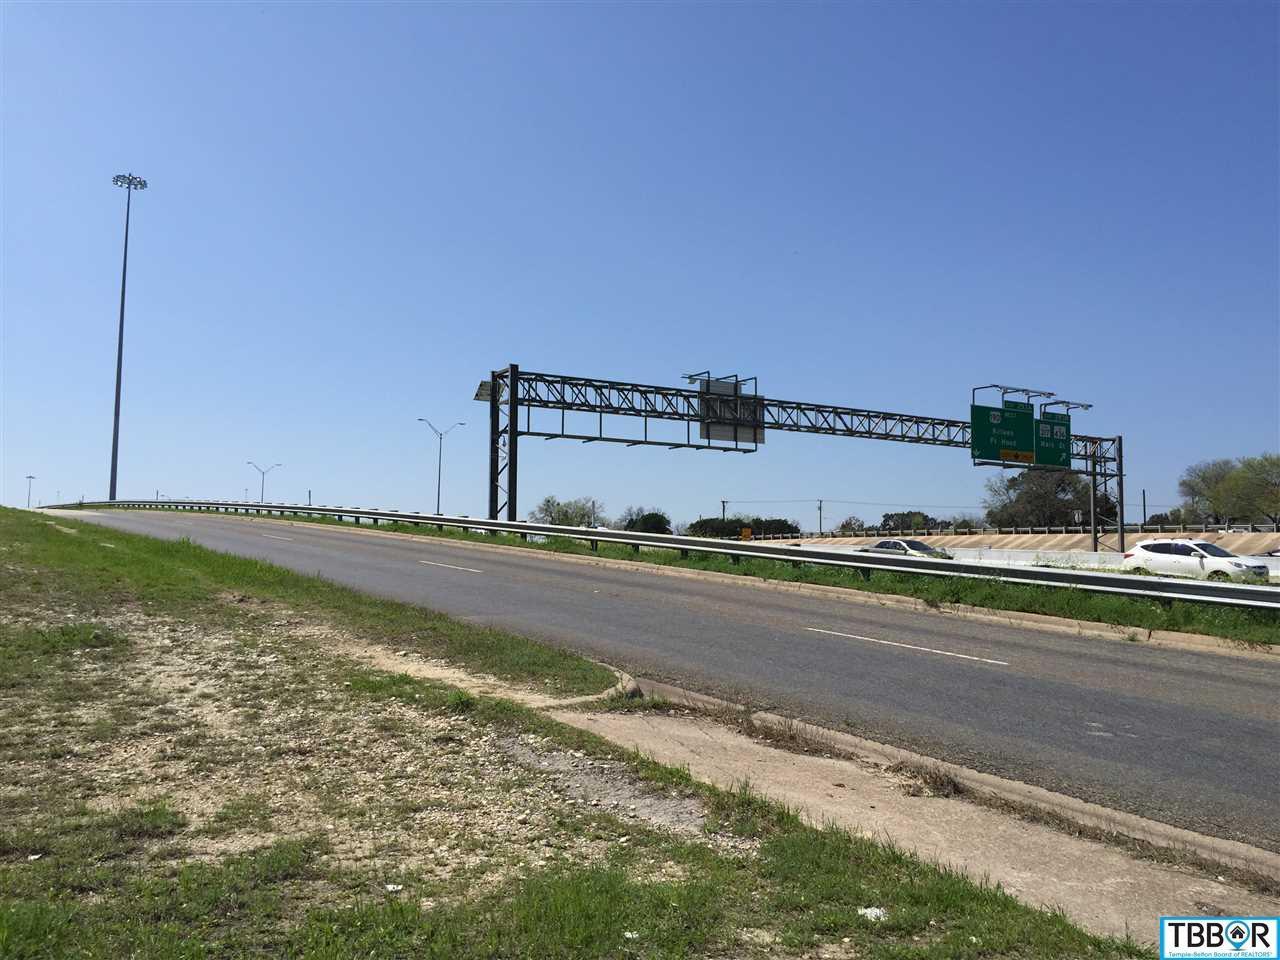 700 S Ih 35, Belton TX 76513 - Photo 2